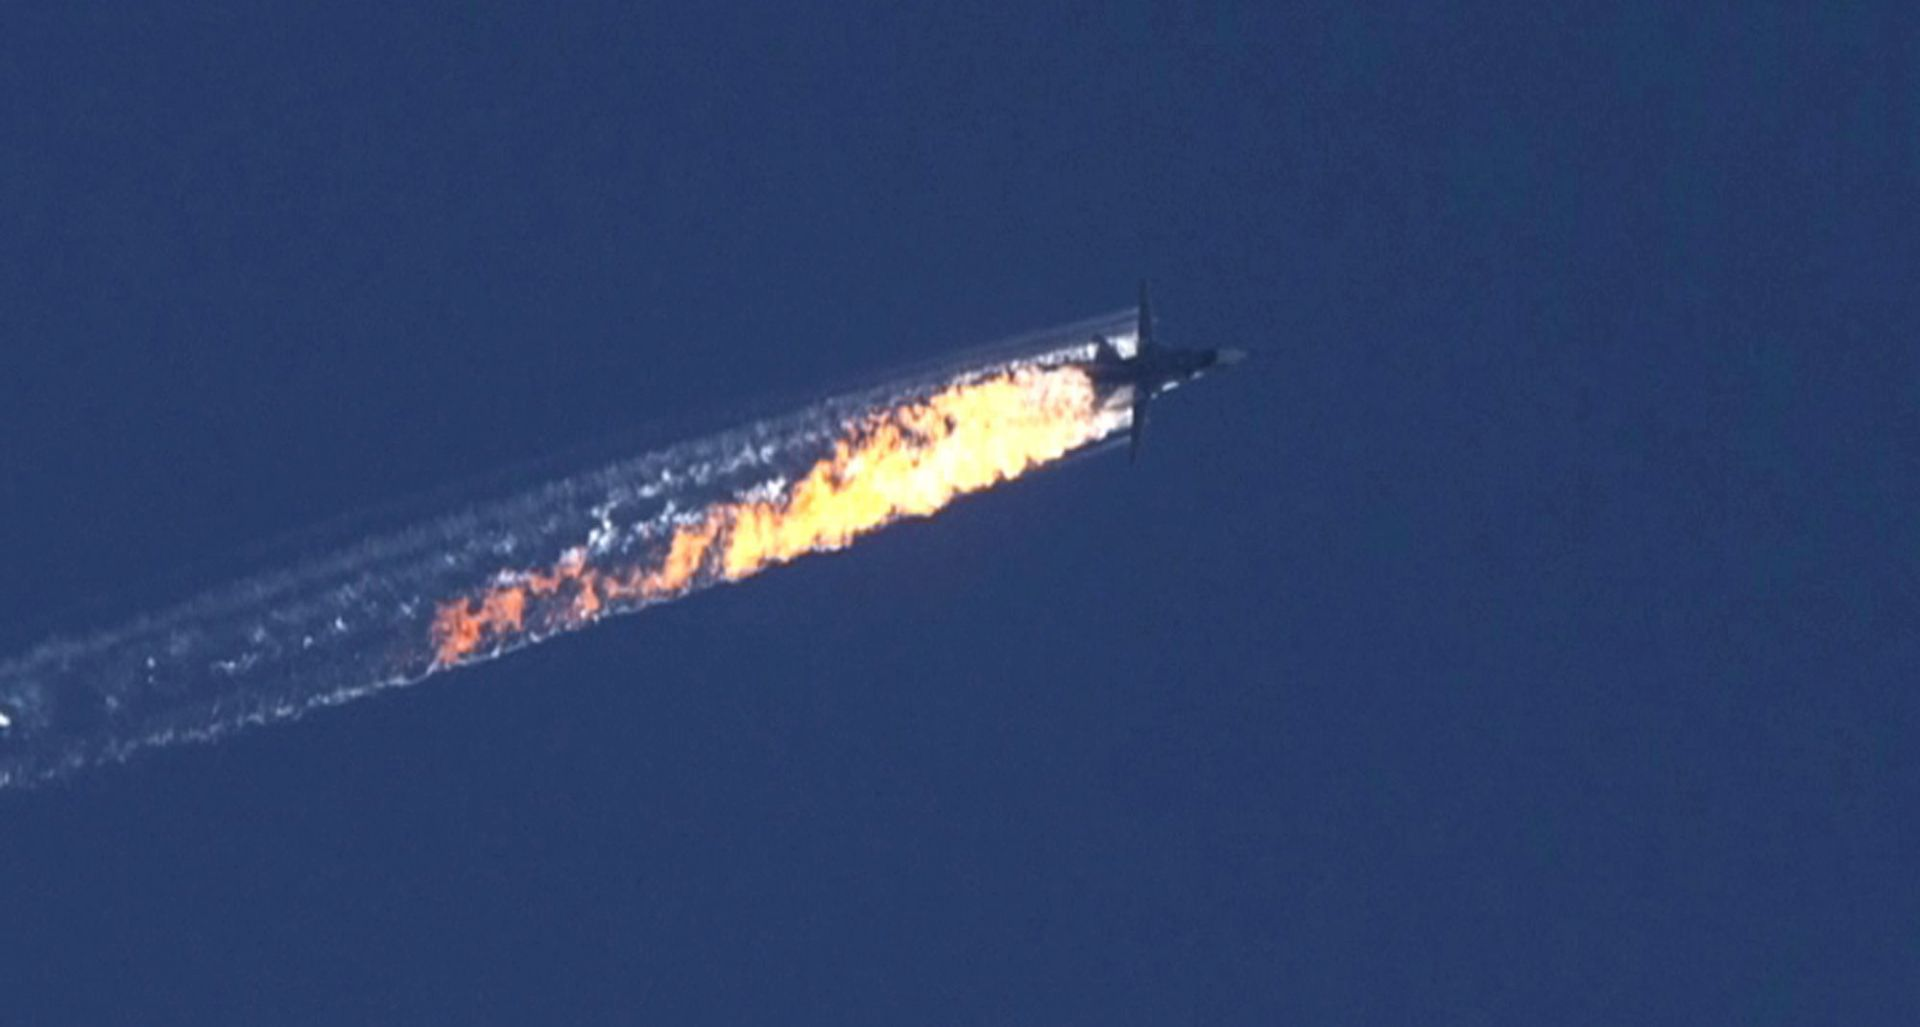 Turska vojska objavila navodnu snimku upozorenja oborenom ruskom zrakoplovu